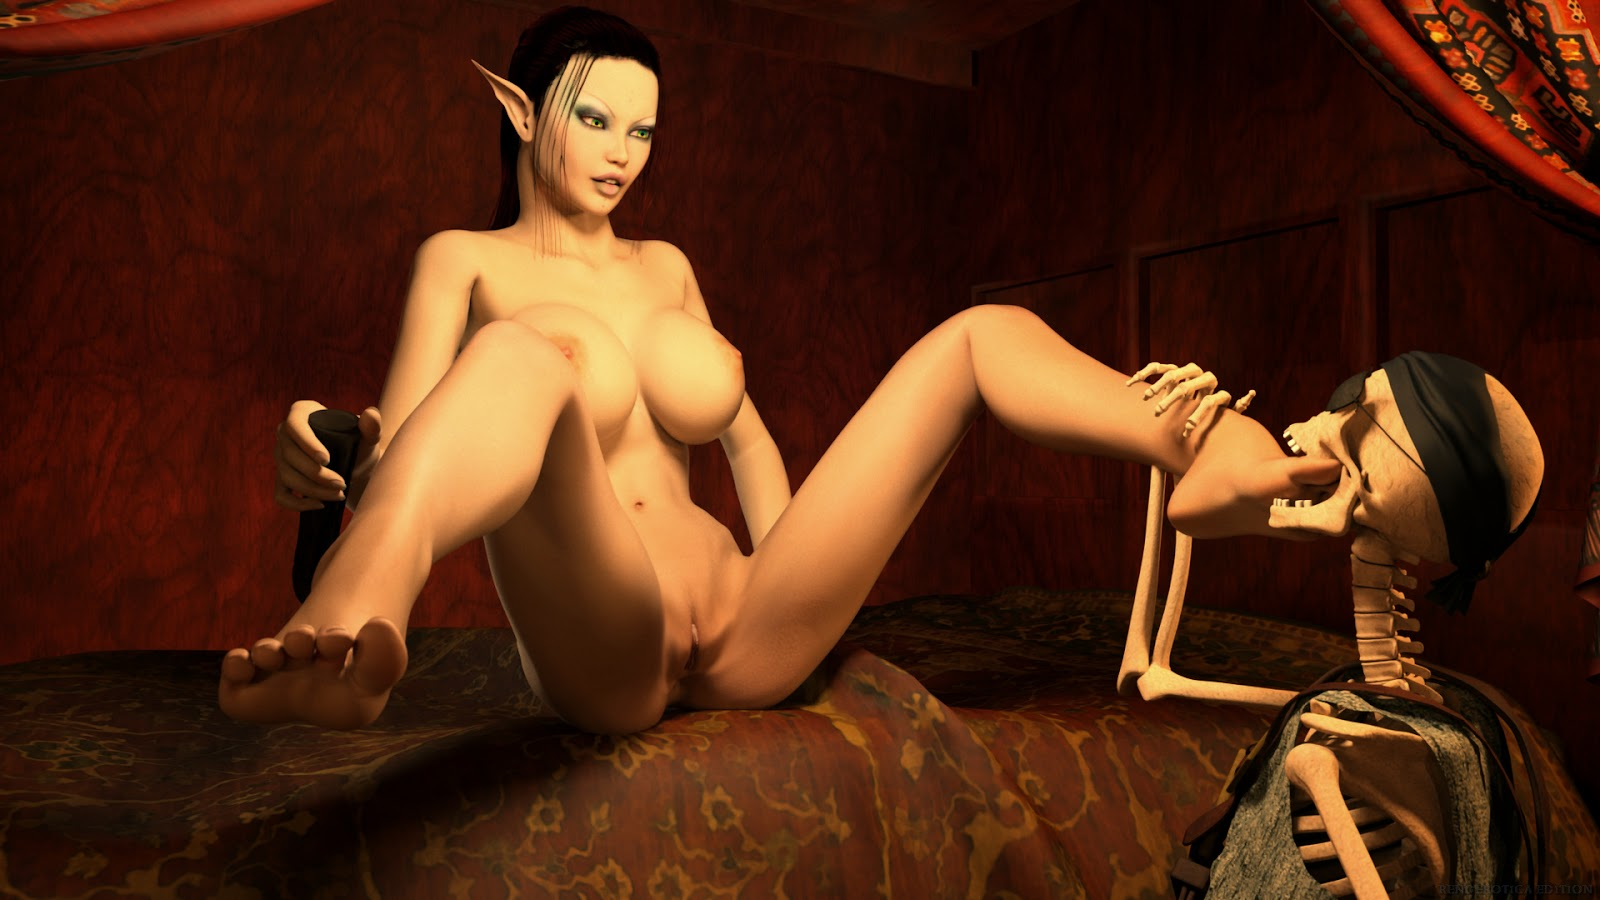 Wild sex orgy with nurse 3d